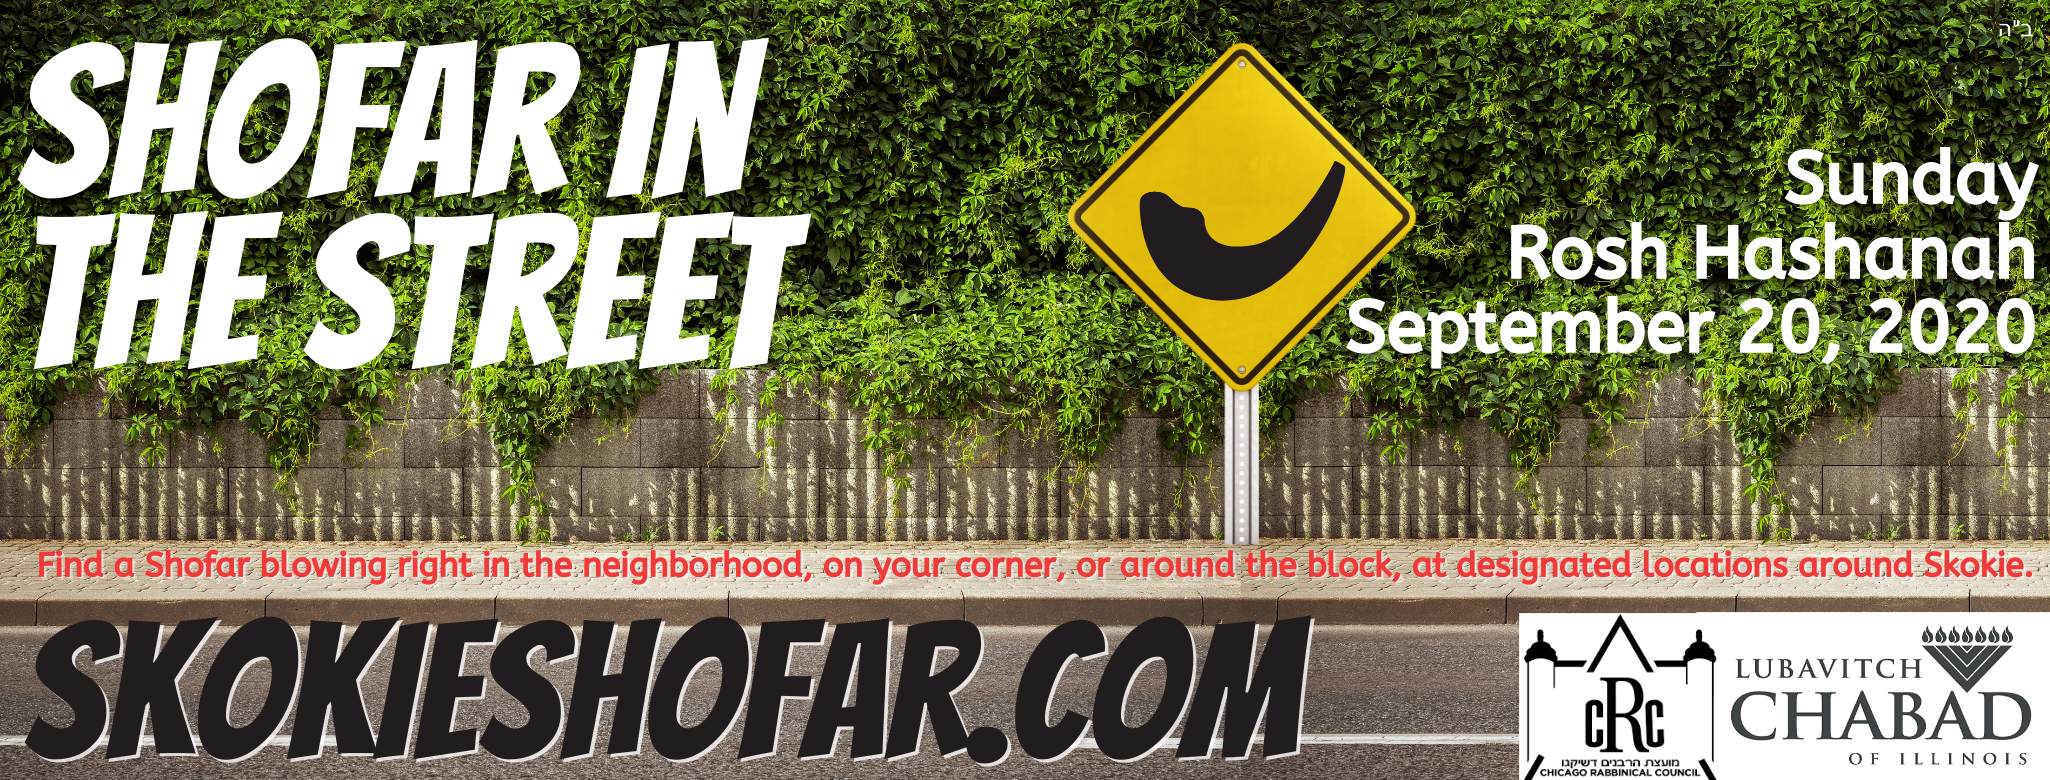 Shofar street header.png